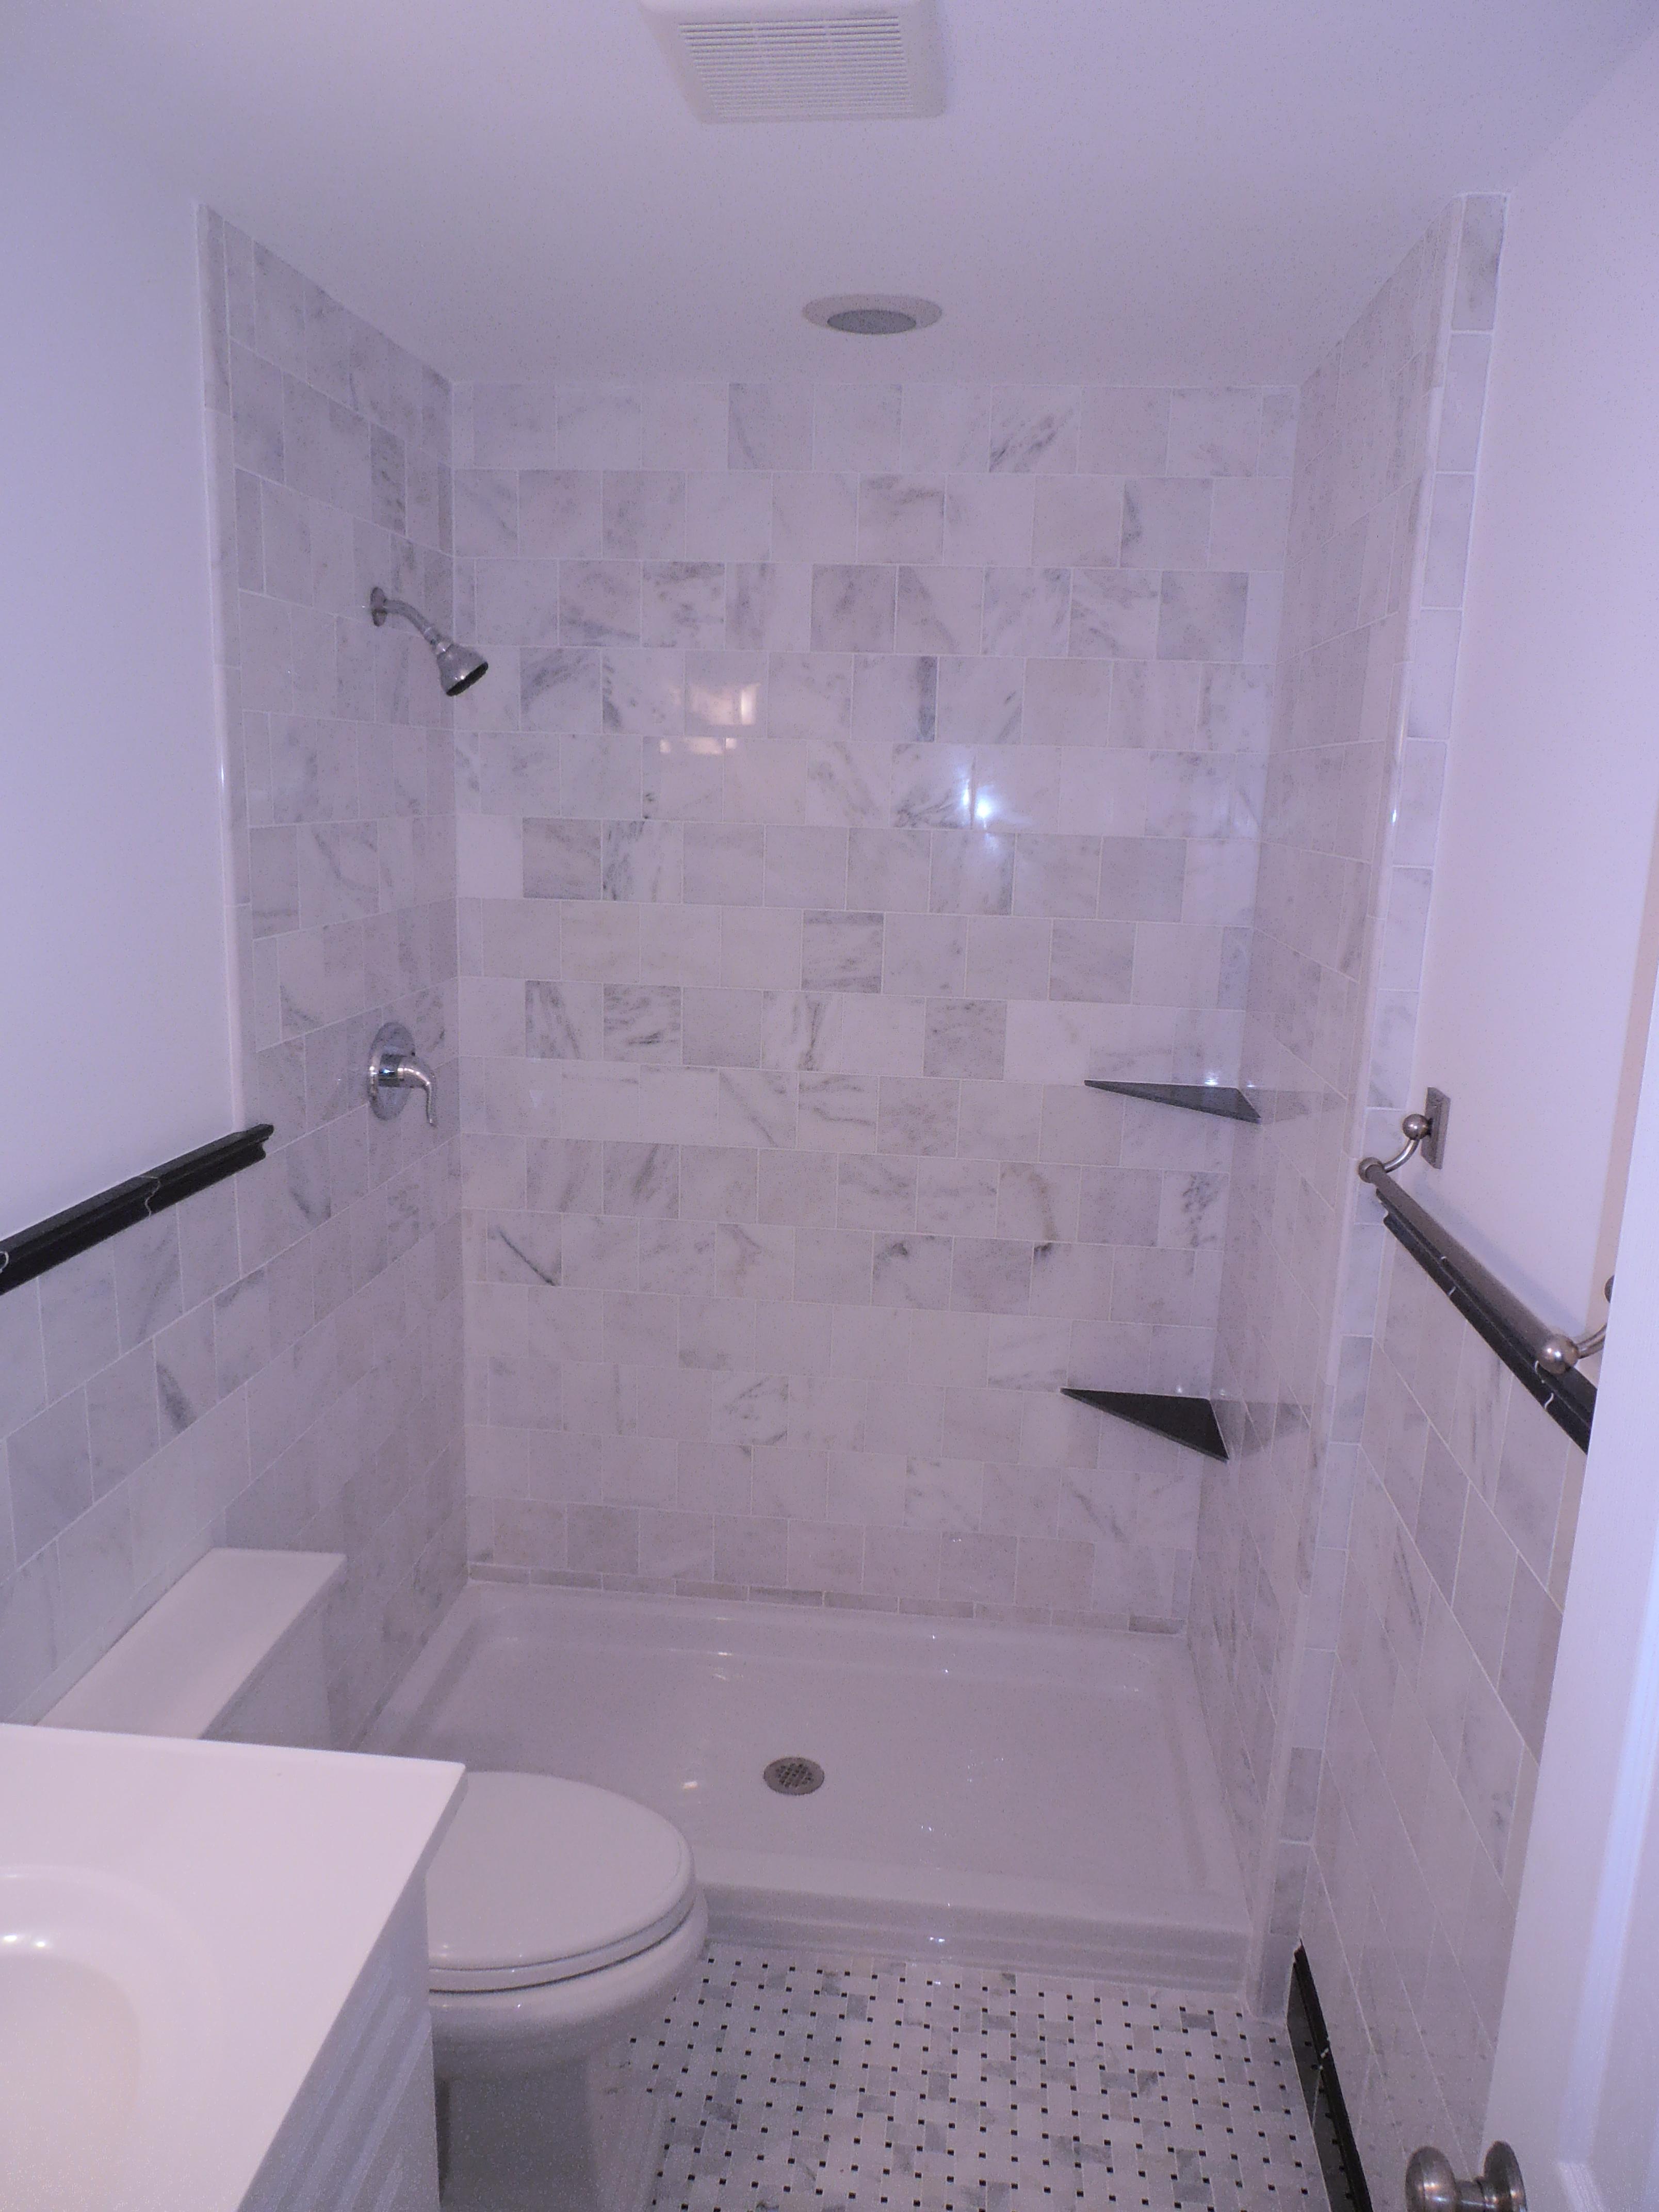 Bathroom Renovation Nassau County: Bathe Safe Walk In Bathtubs